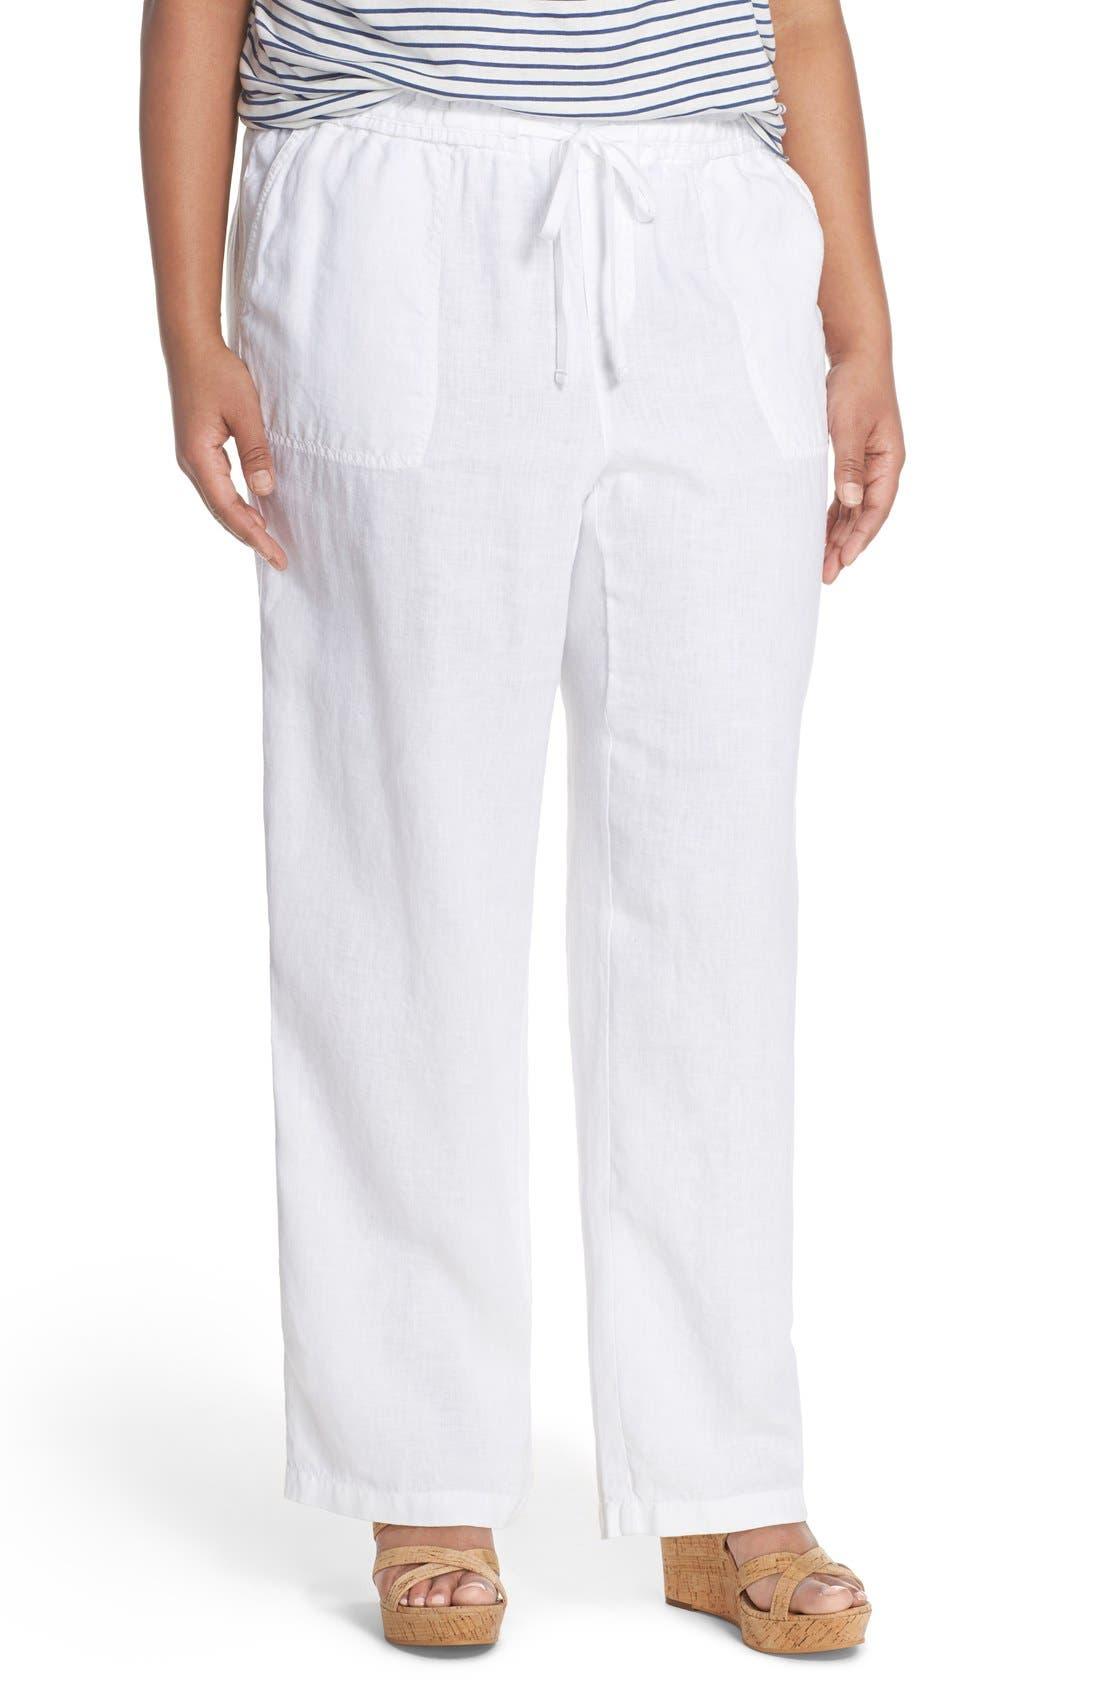 White Drawstring Linen Pants af9RuUX2